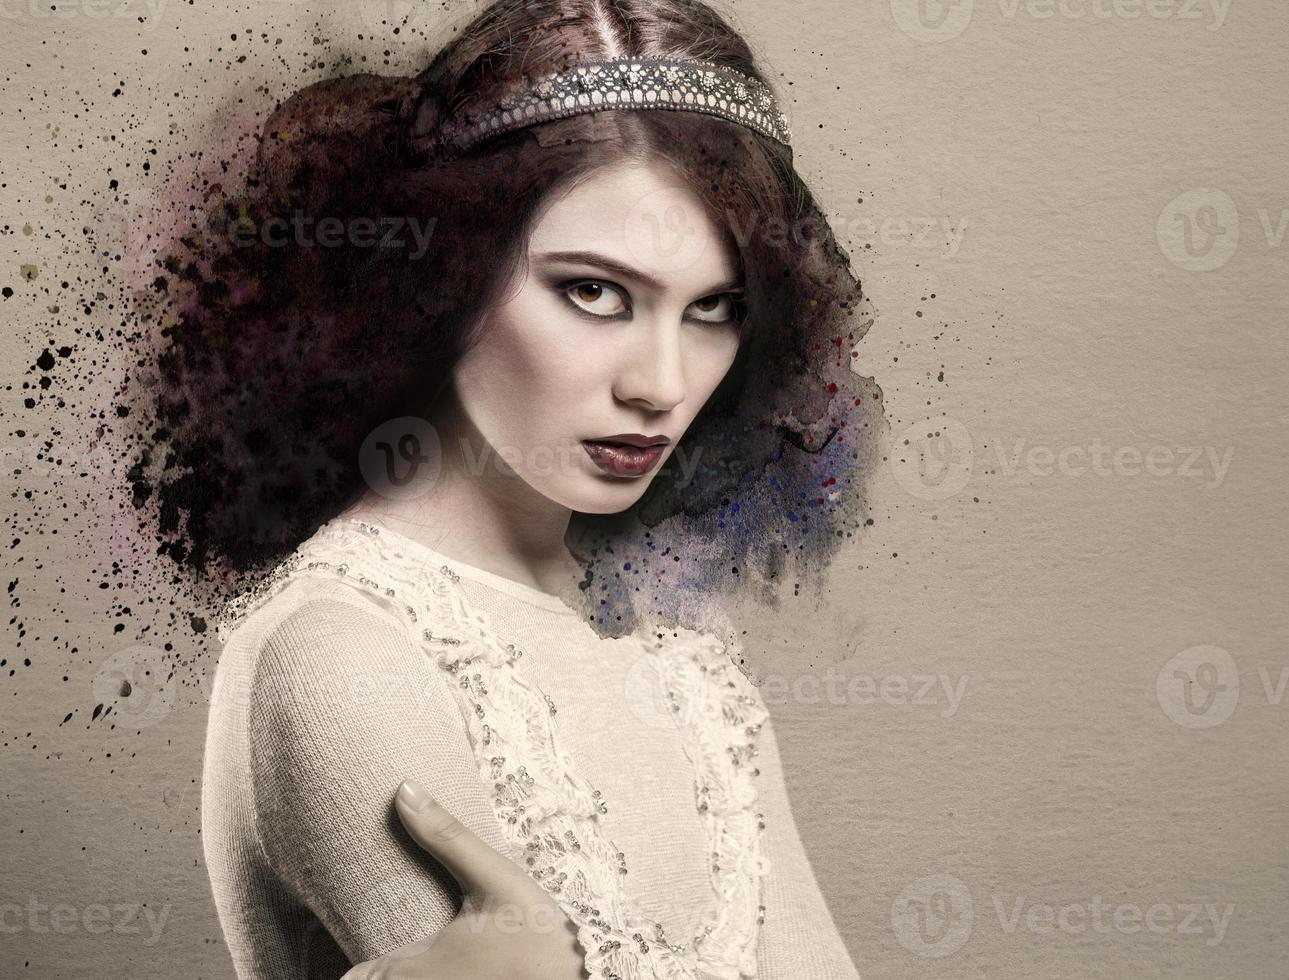 hermosa jovencita foto